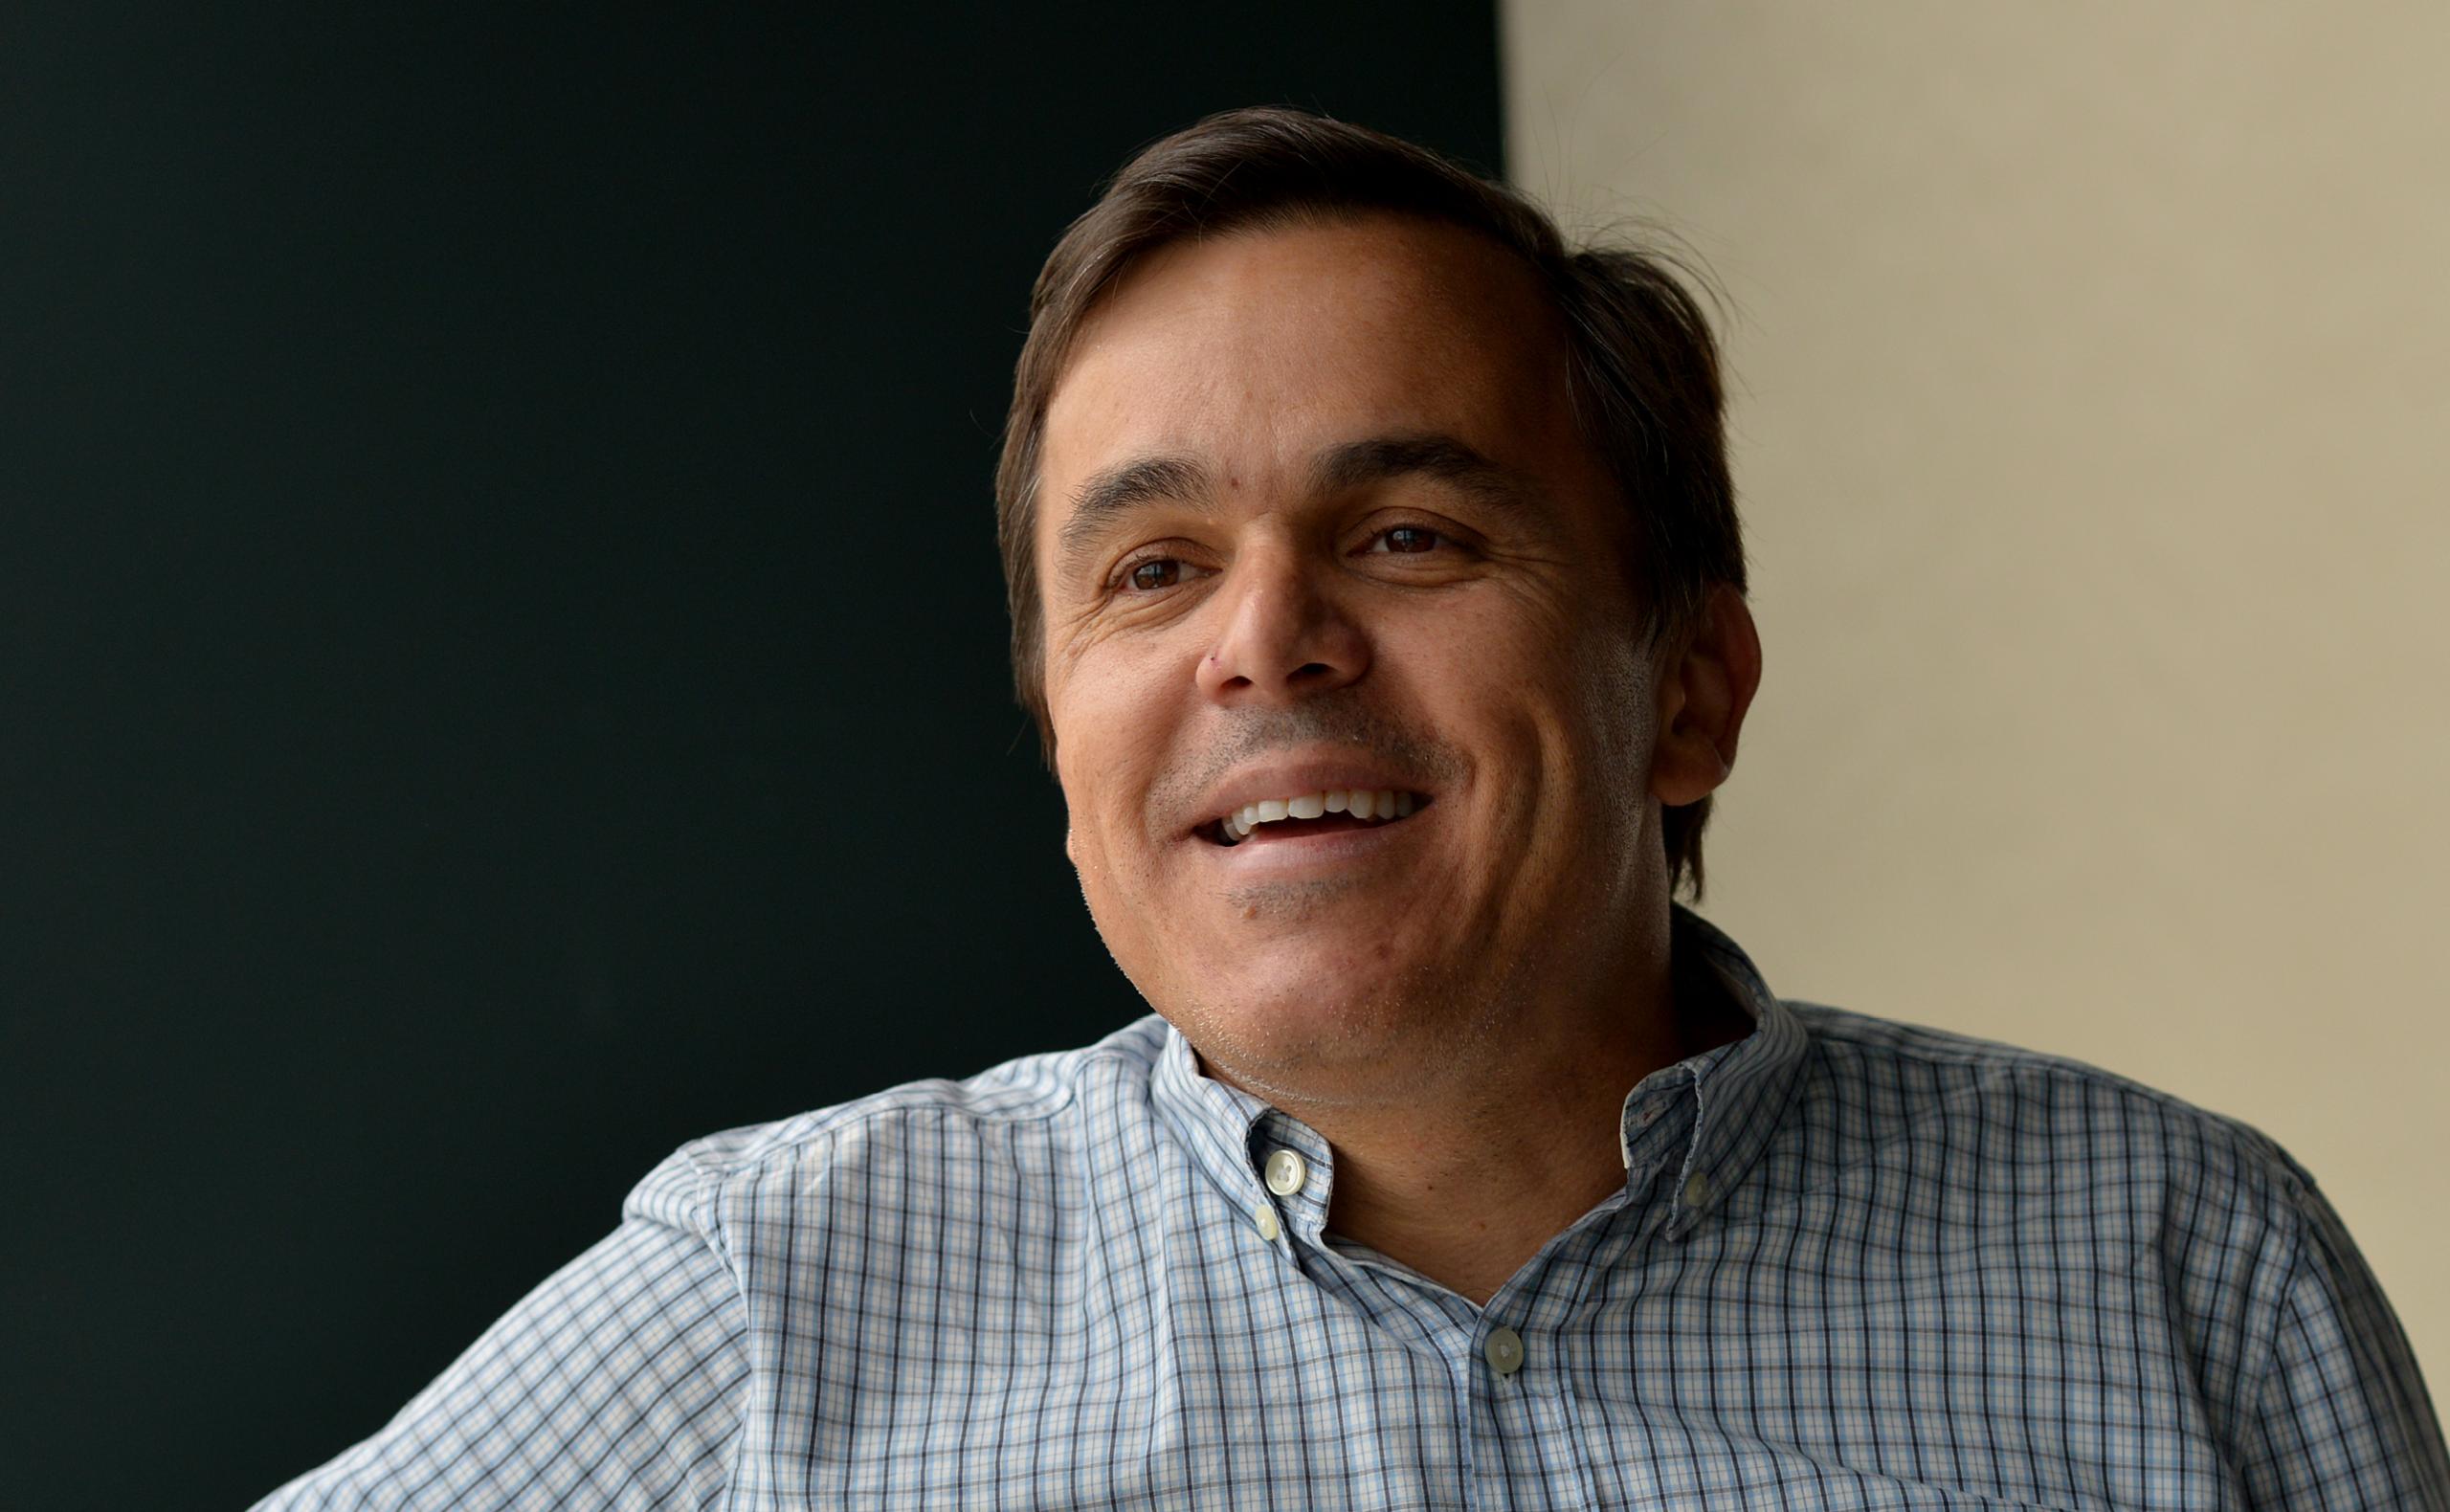 Gestora de Pierre Schurmann quer investir em mil startups